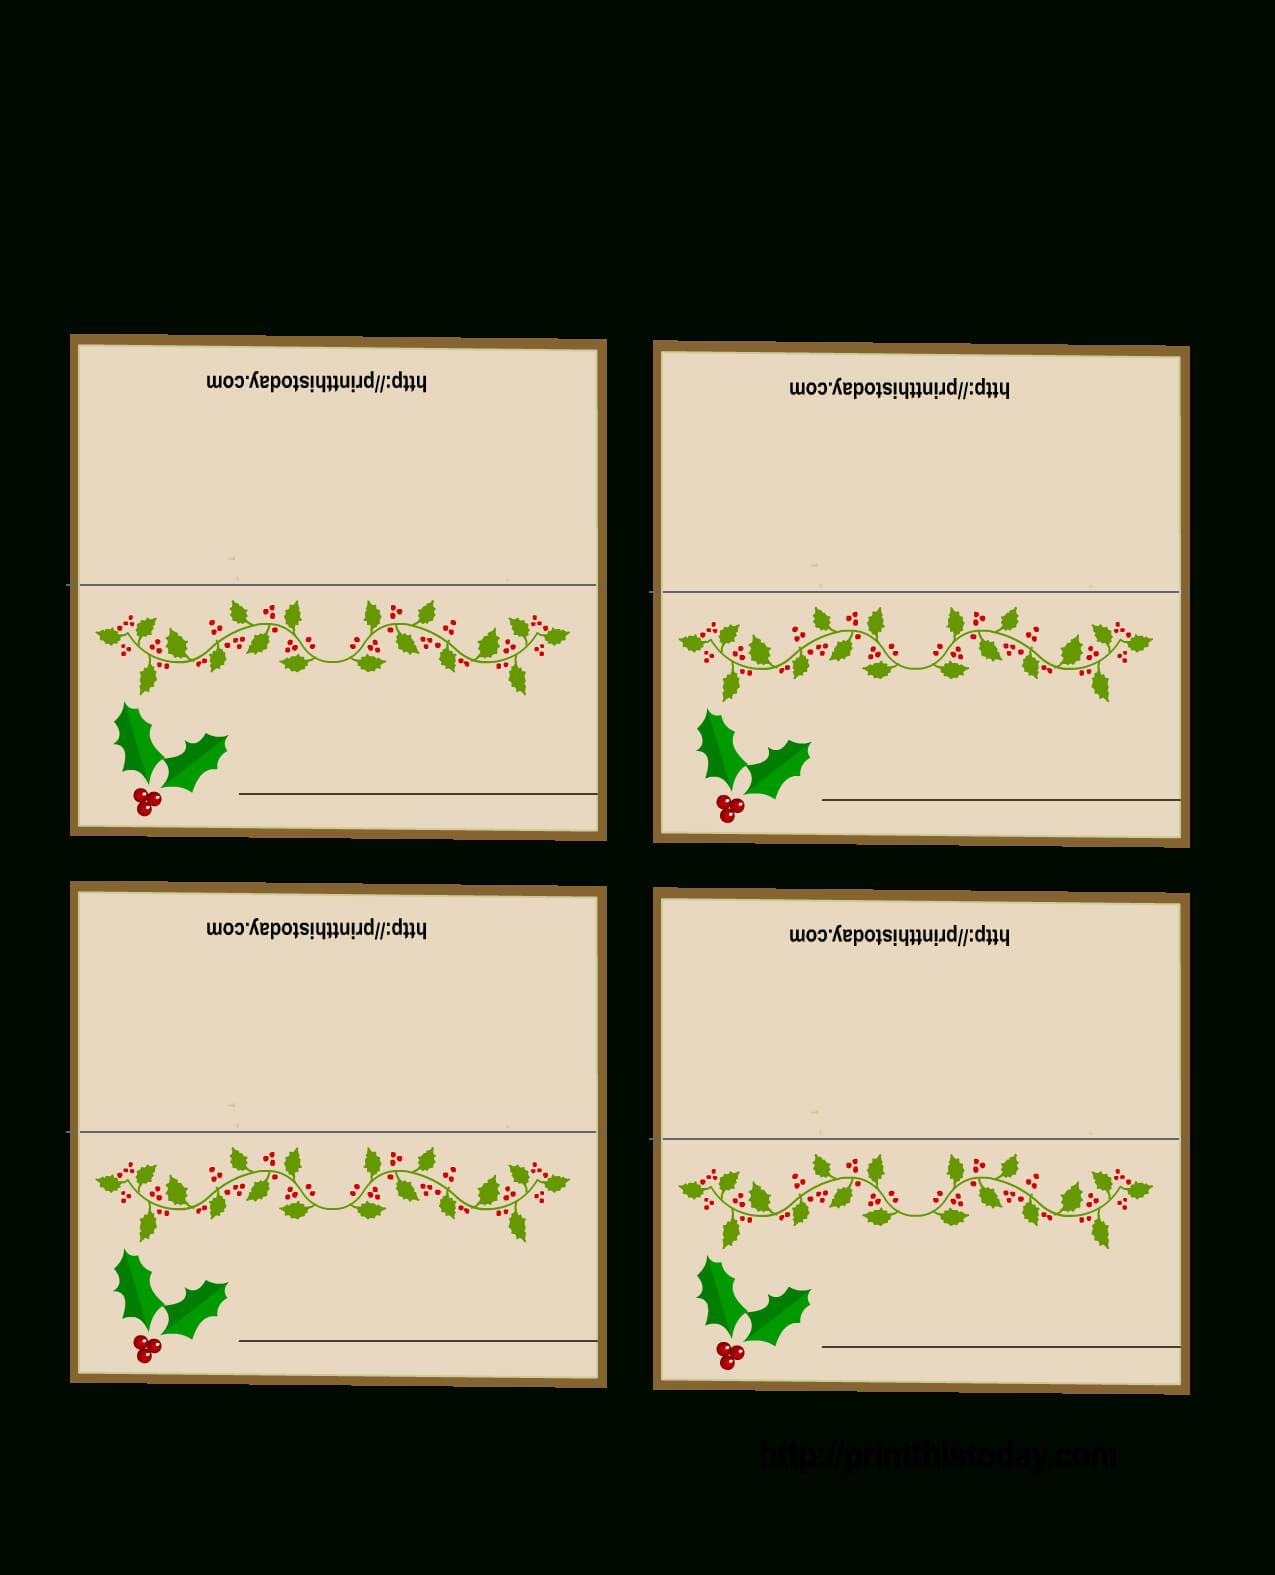 003 Table Name Cards Template Christmas Ideas Place Intended For Christmas Table Place Cards Template